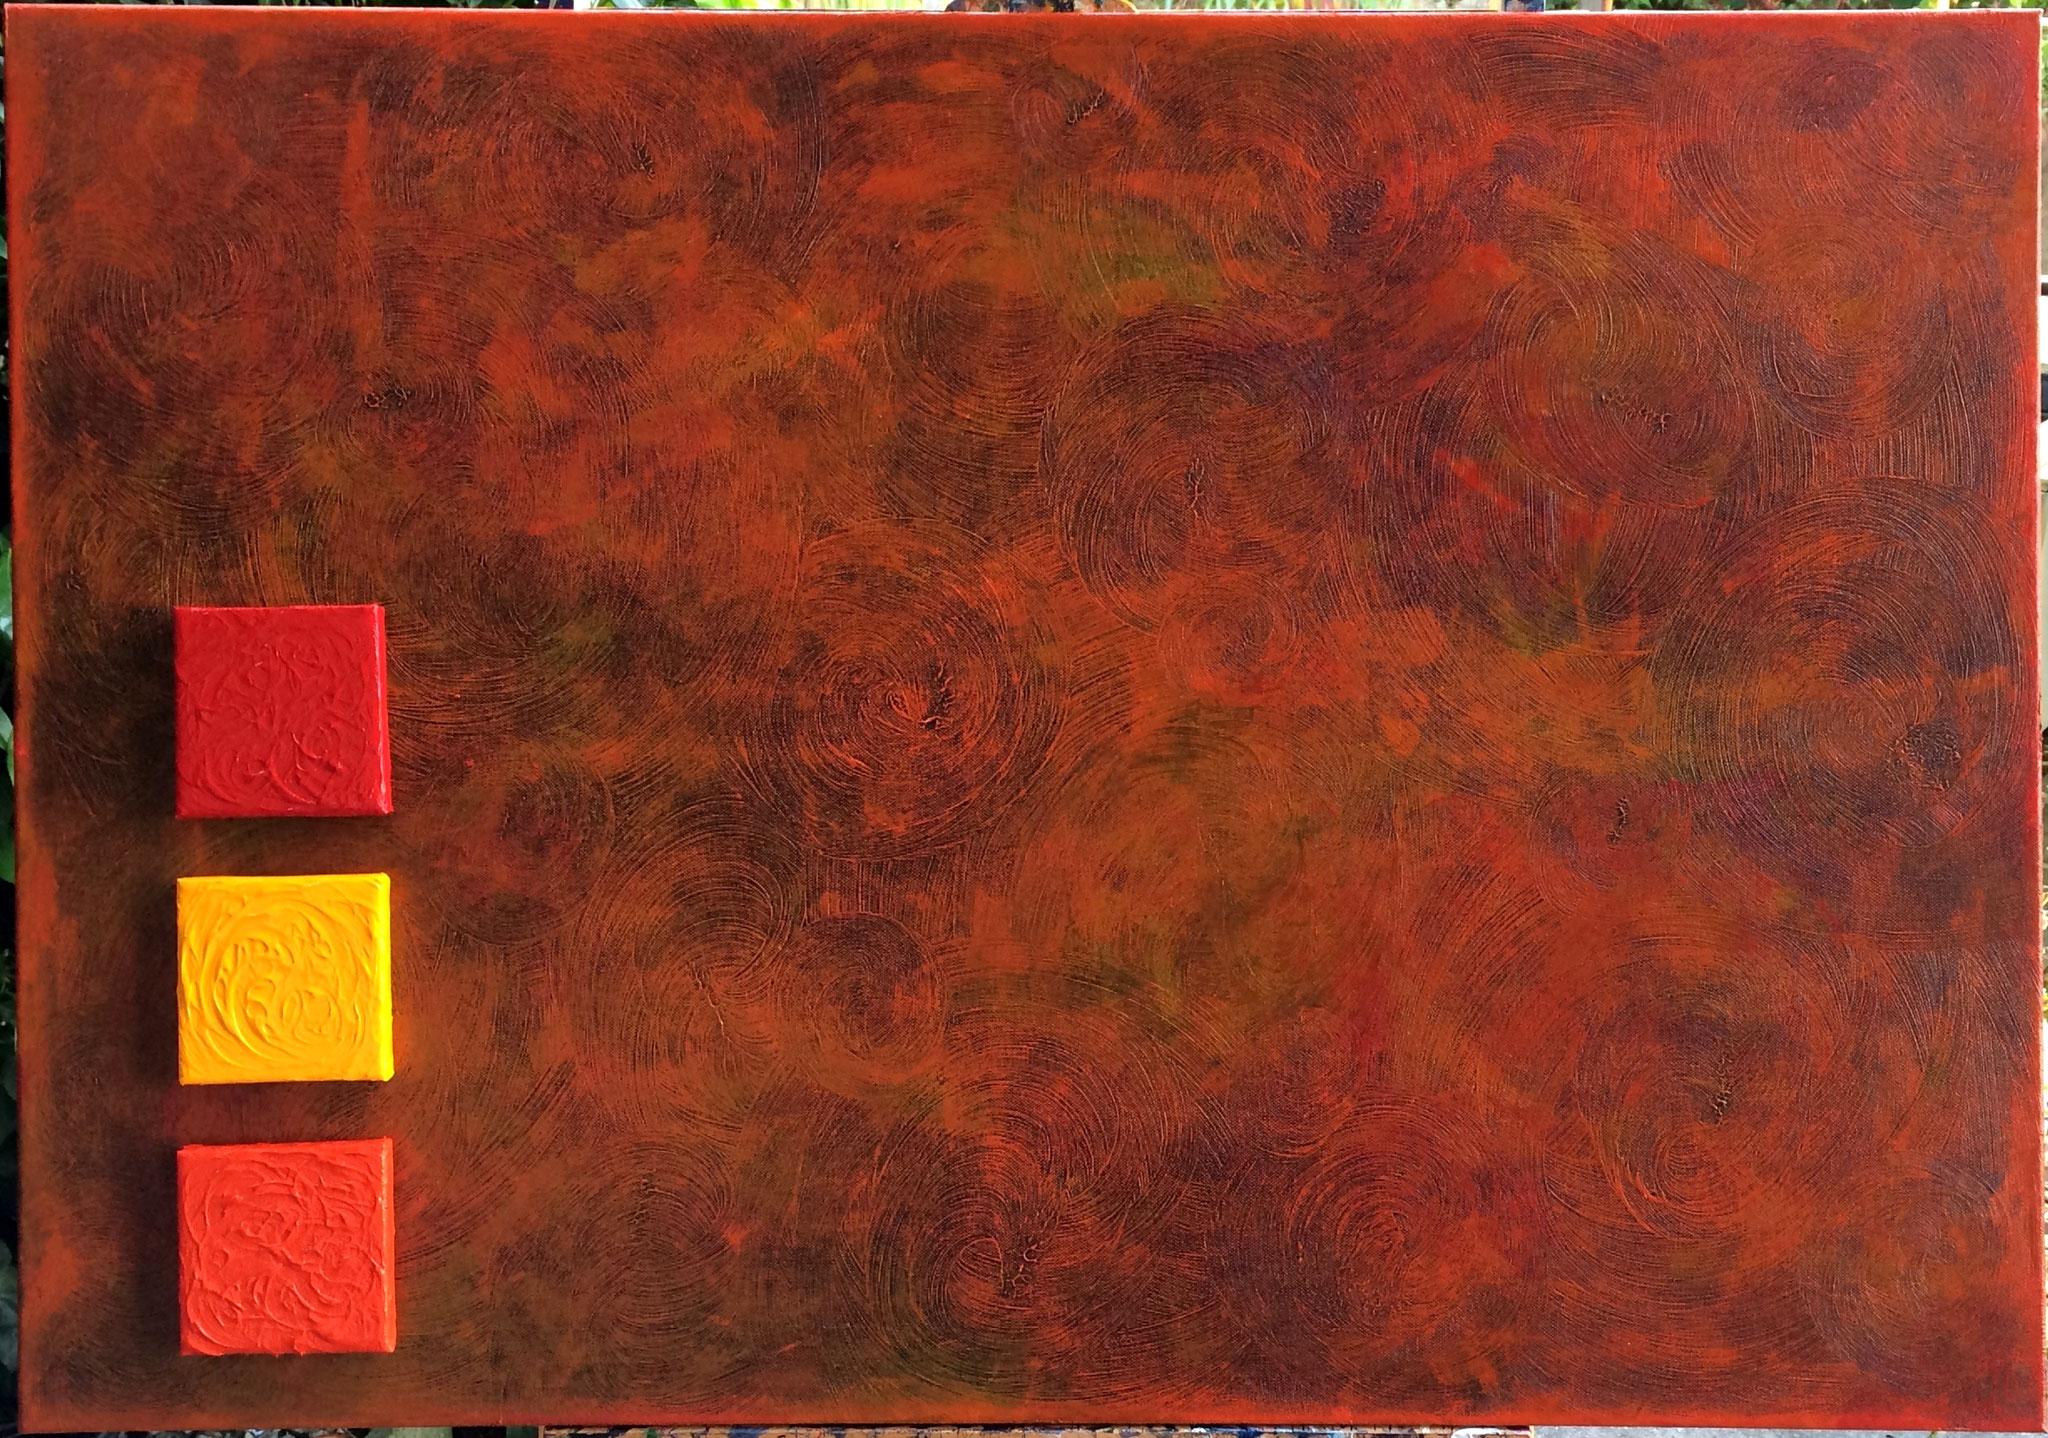 L'incandescence - 70 x 100 cm